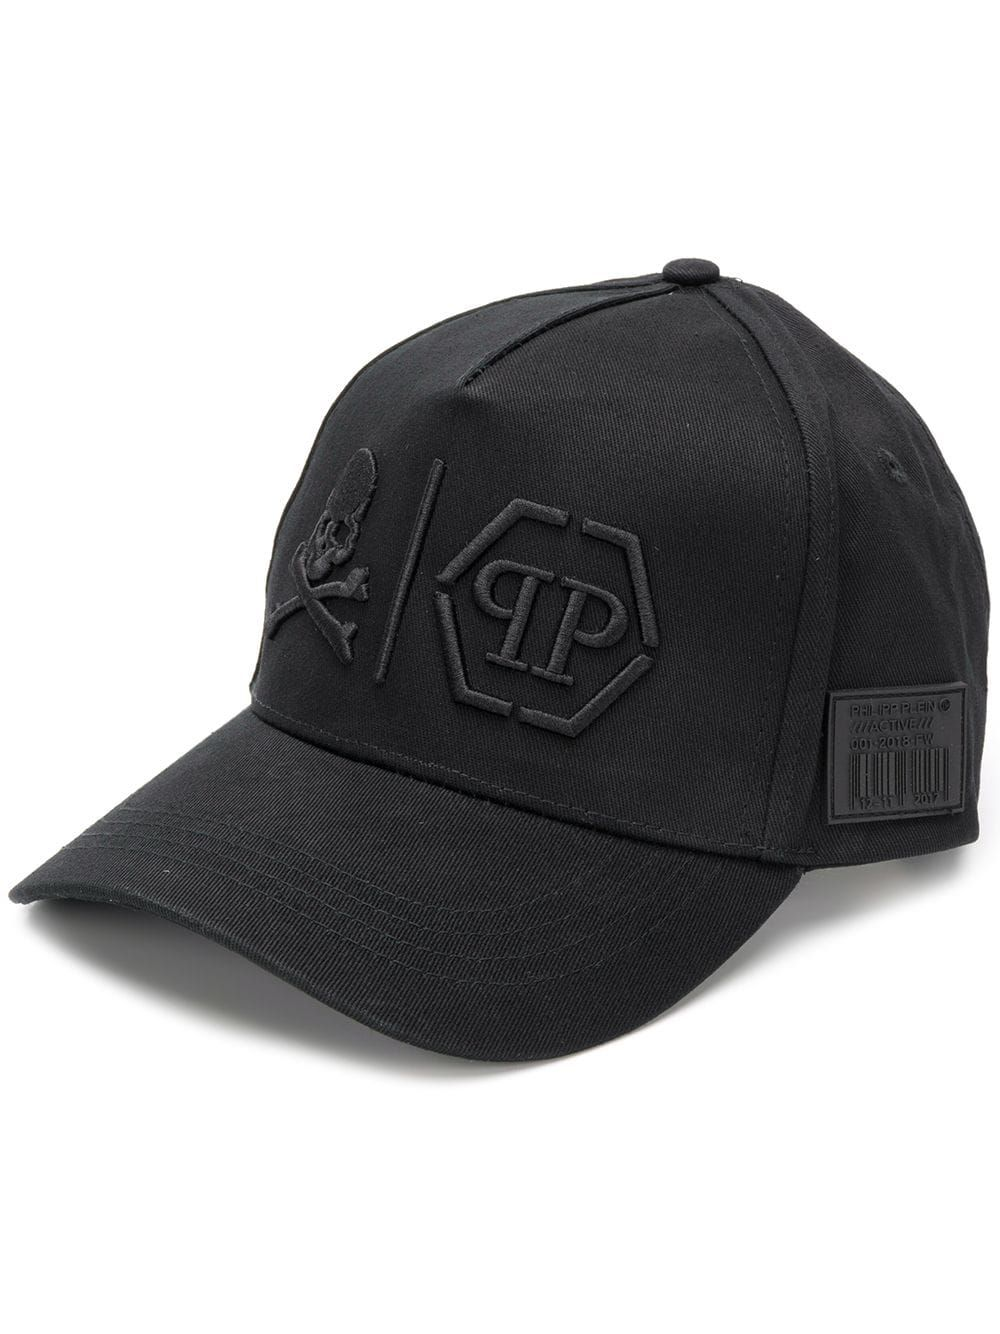 cde2563fa77 PHILIPP PLEIN PHILIPP PLEIN  SIMPLE SKULL  CAP - BLACK.  philippplein